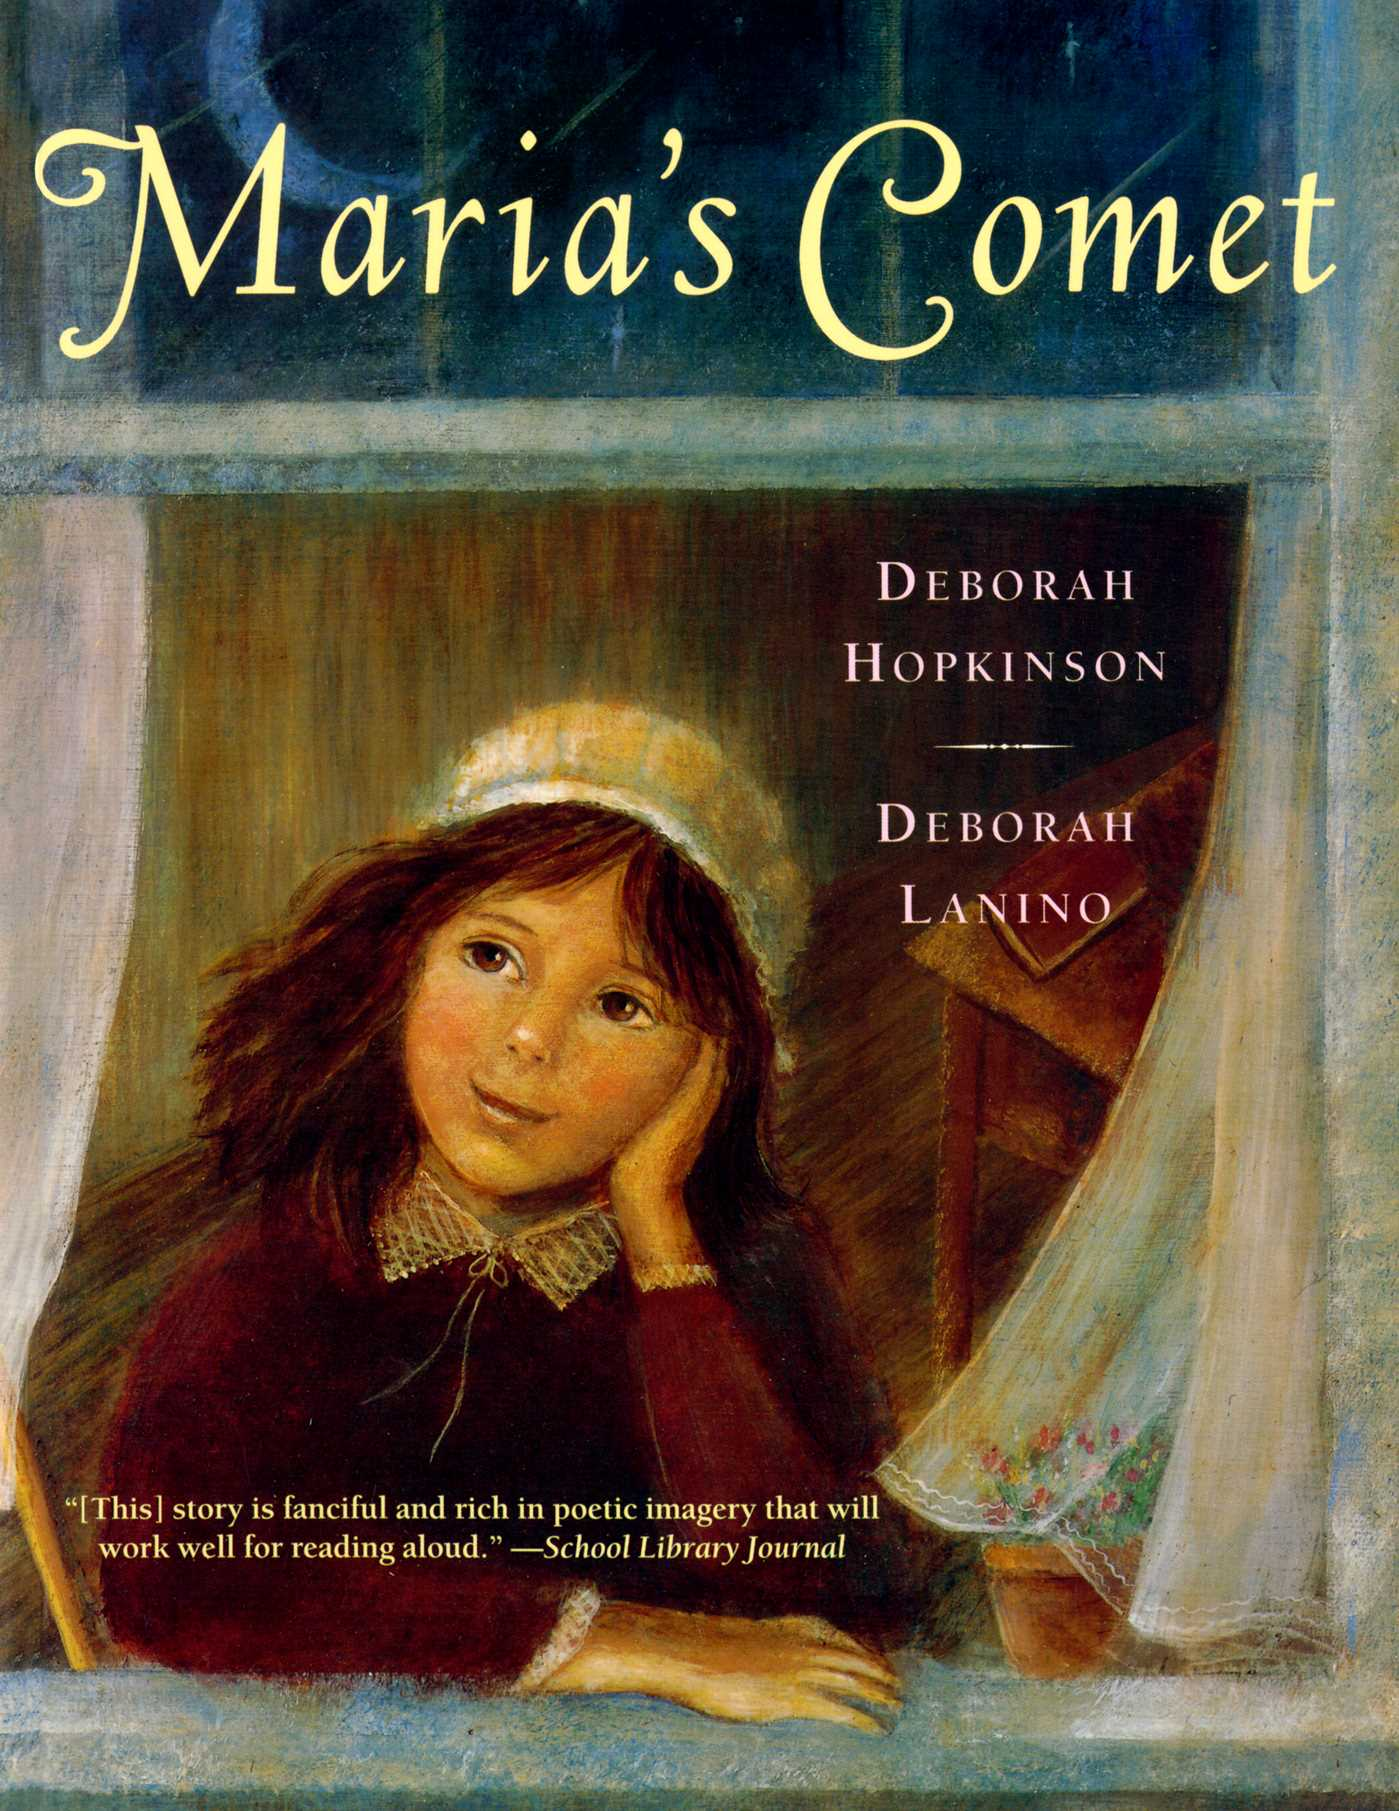 Marias comet 9781442484580 hr